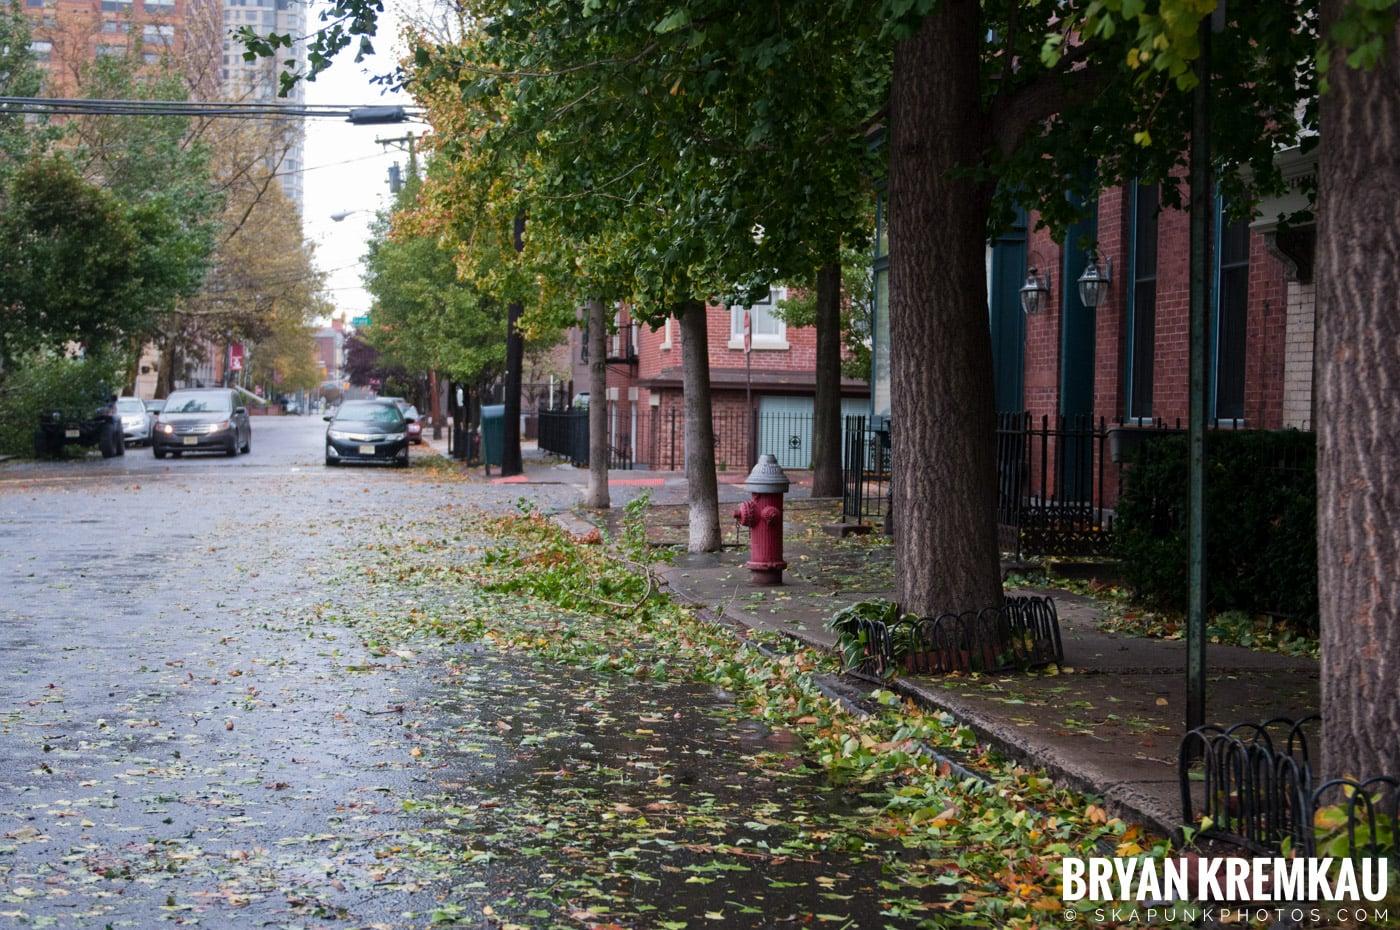 Hurricane Sandy 2012 @ Paulus Hook, Jersey City - 10.29.12 - 10.30.12 (35)